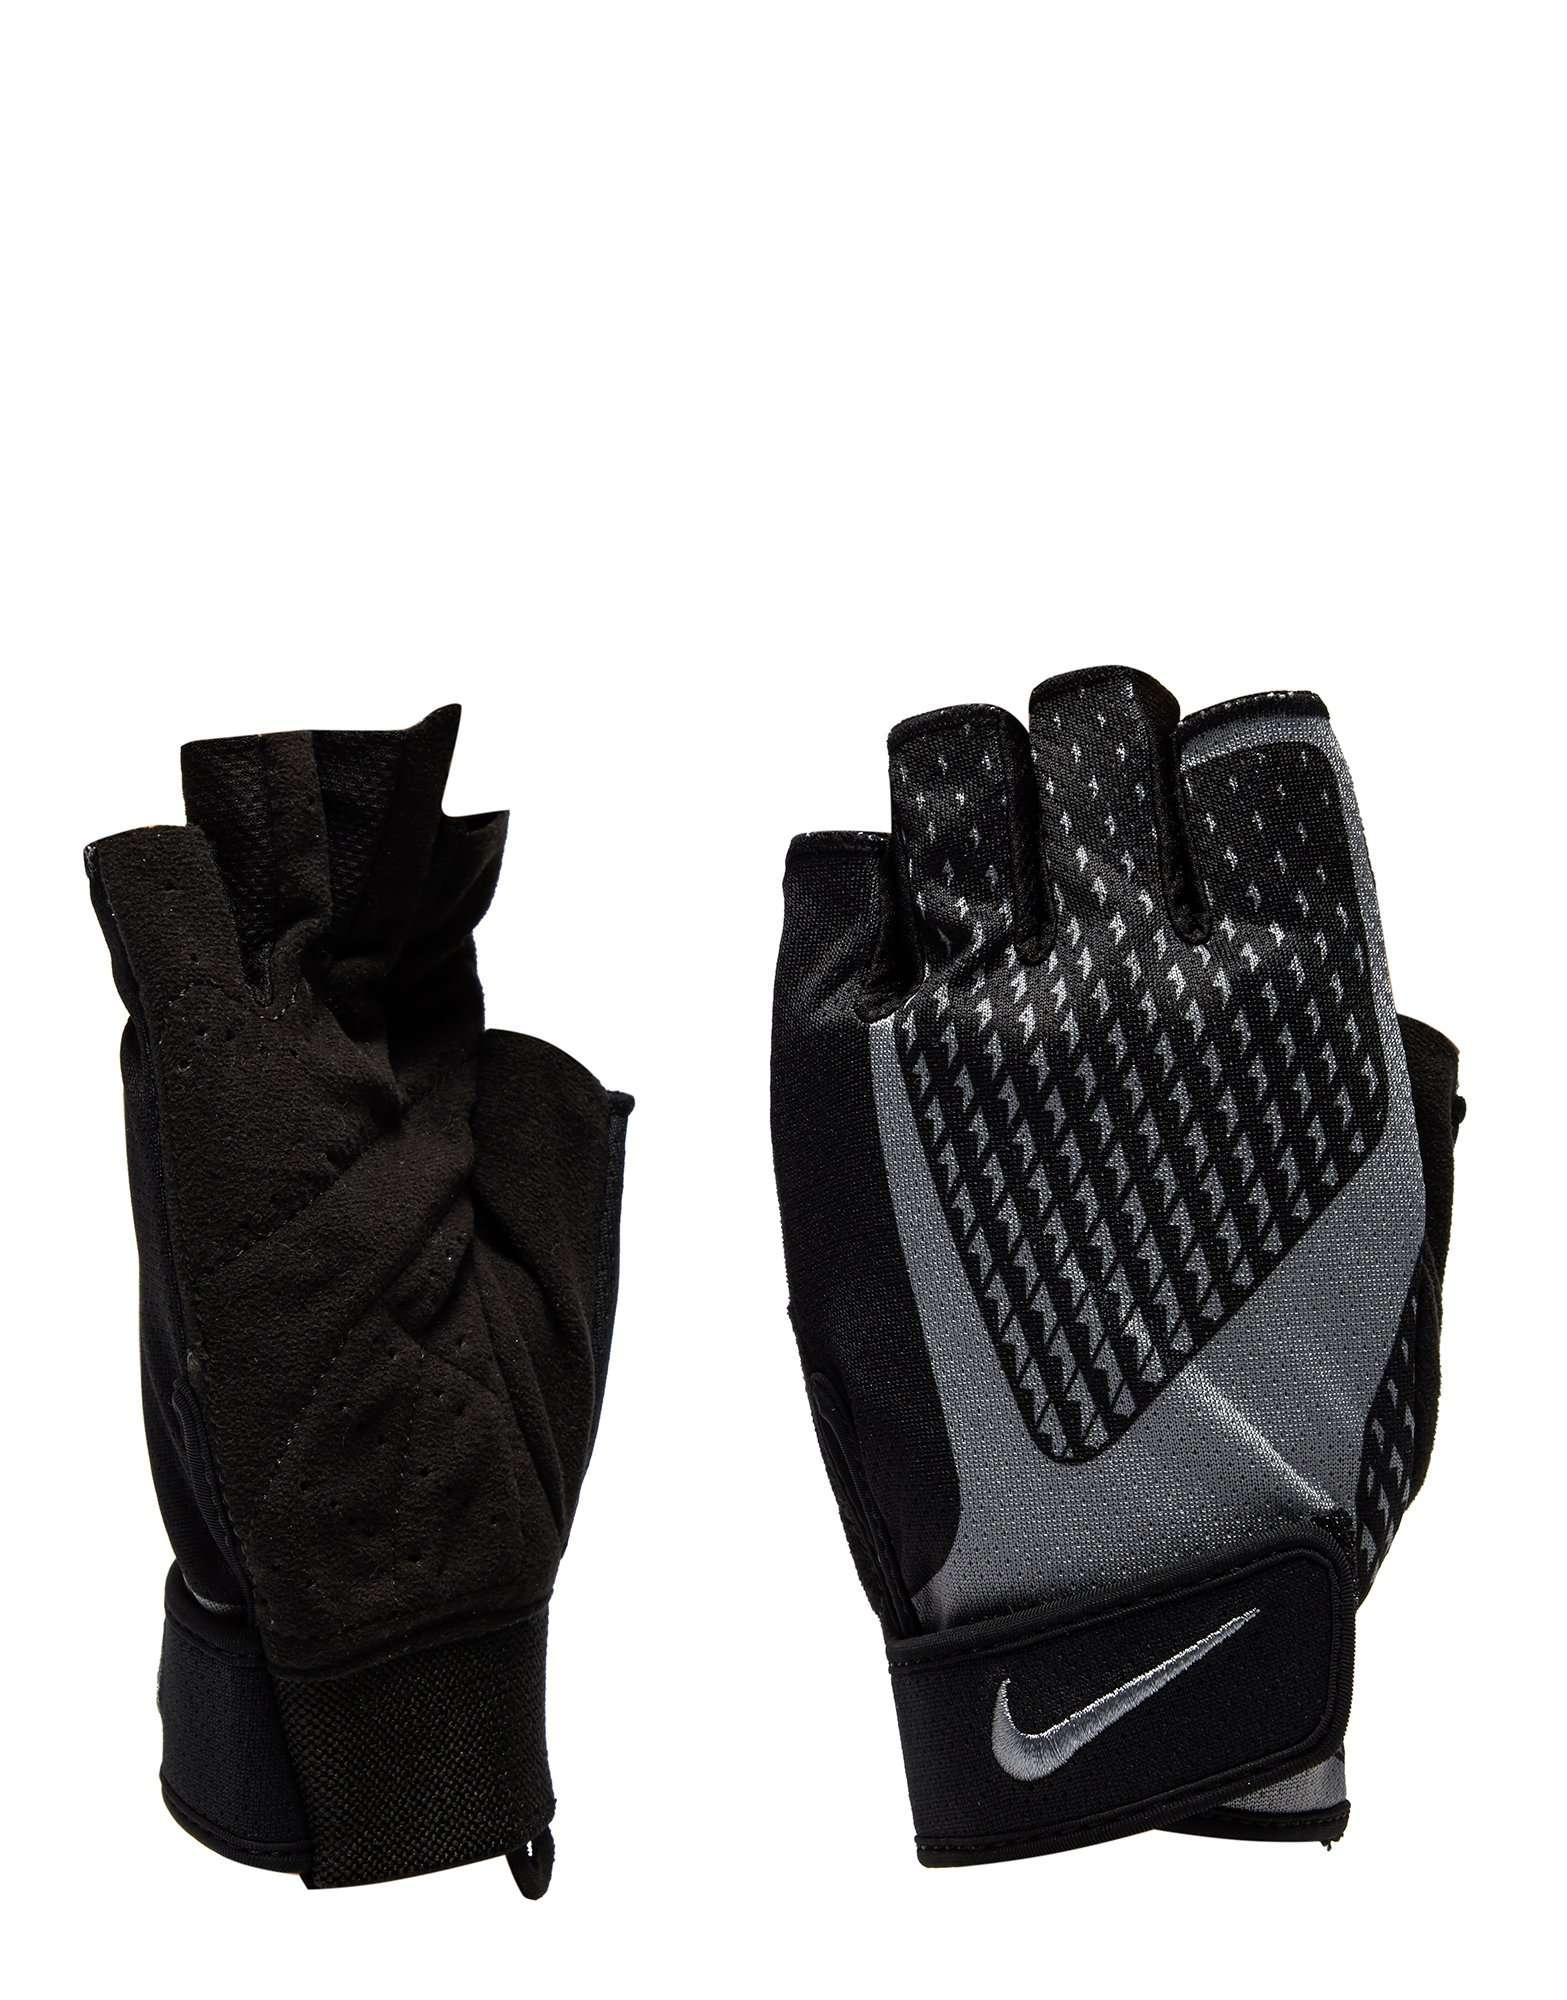 Leather gloves mens jd - Leather Gloves Mens Jd 23